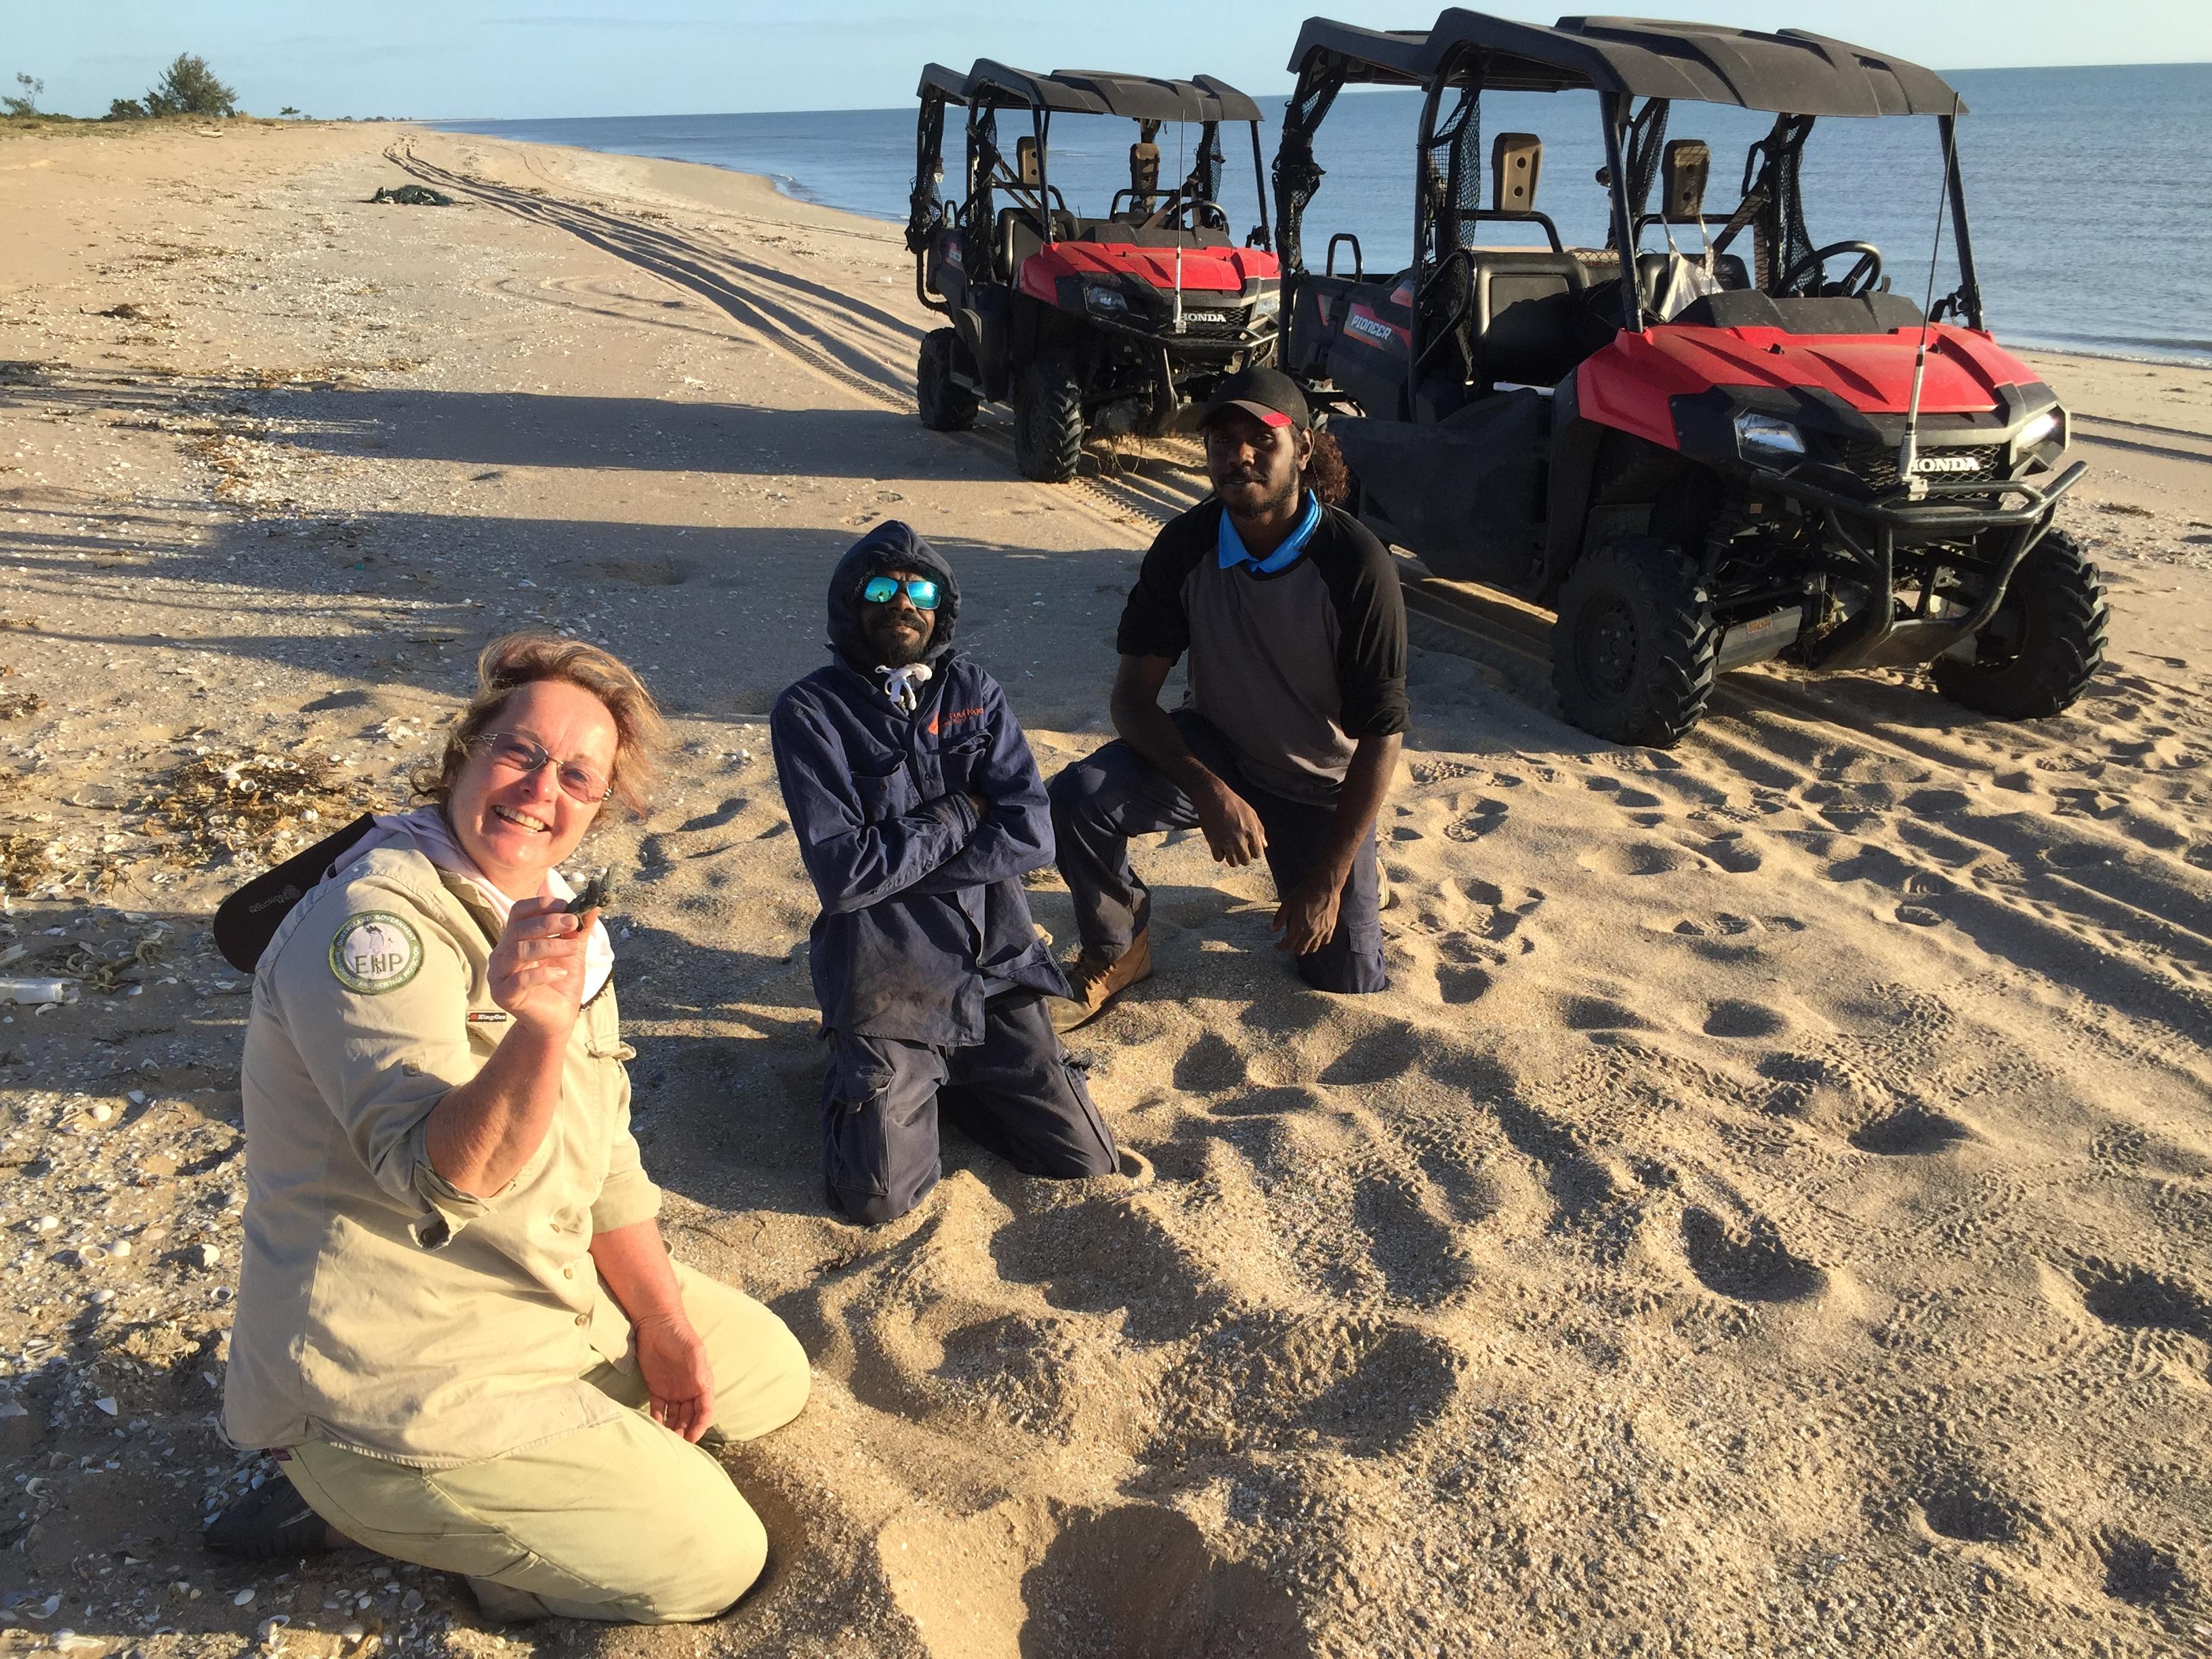 Turtles survey team on Cape York beach